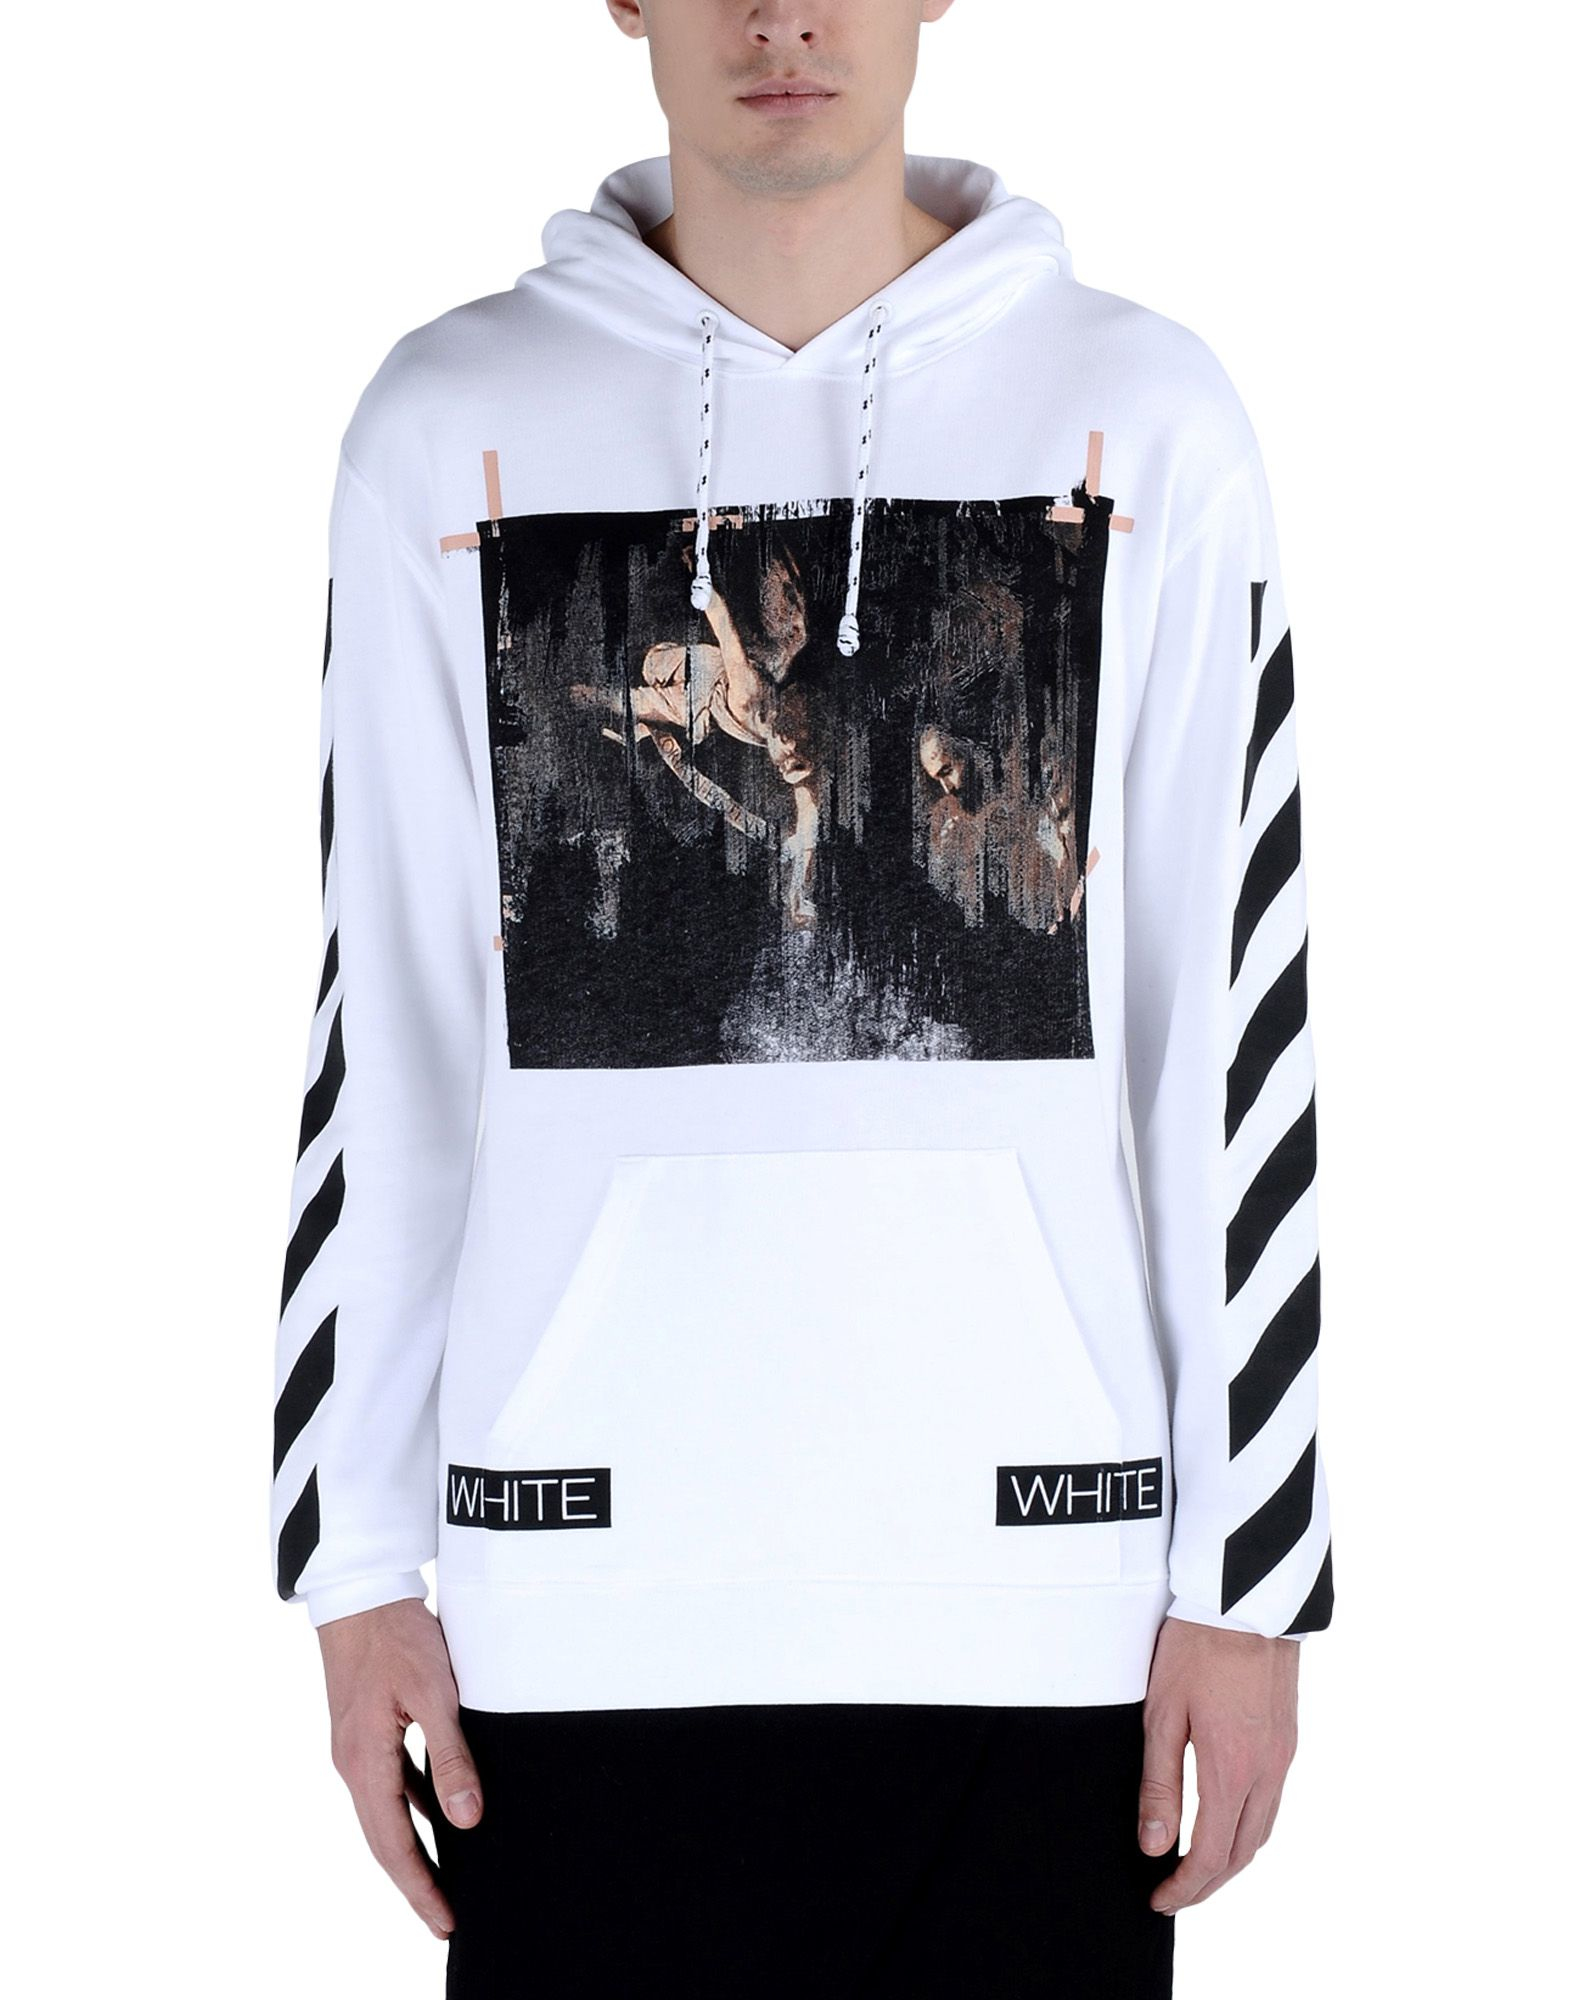 off white c o virgil abloh sweatshirt in white for men lyst. Black Bedroom Furniture Sets. Home Design Ideas